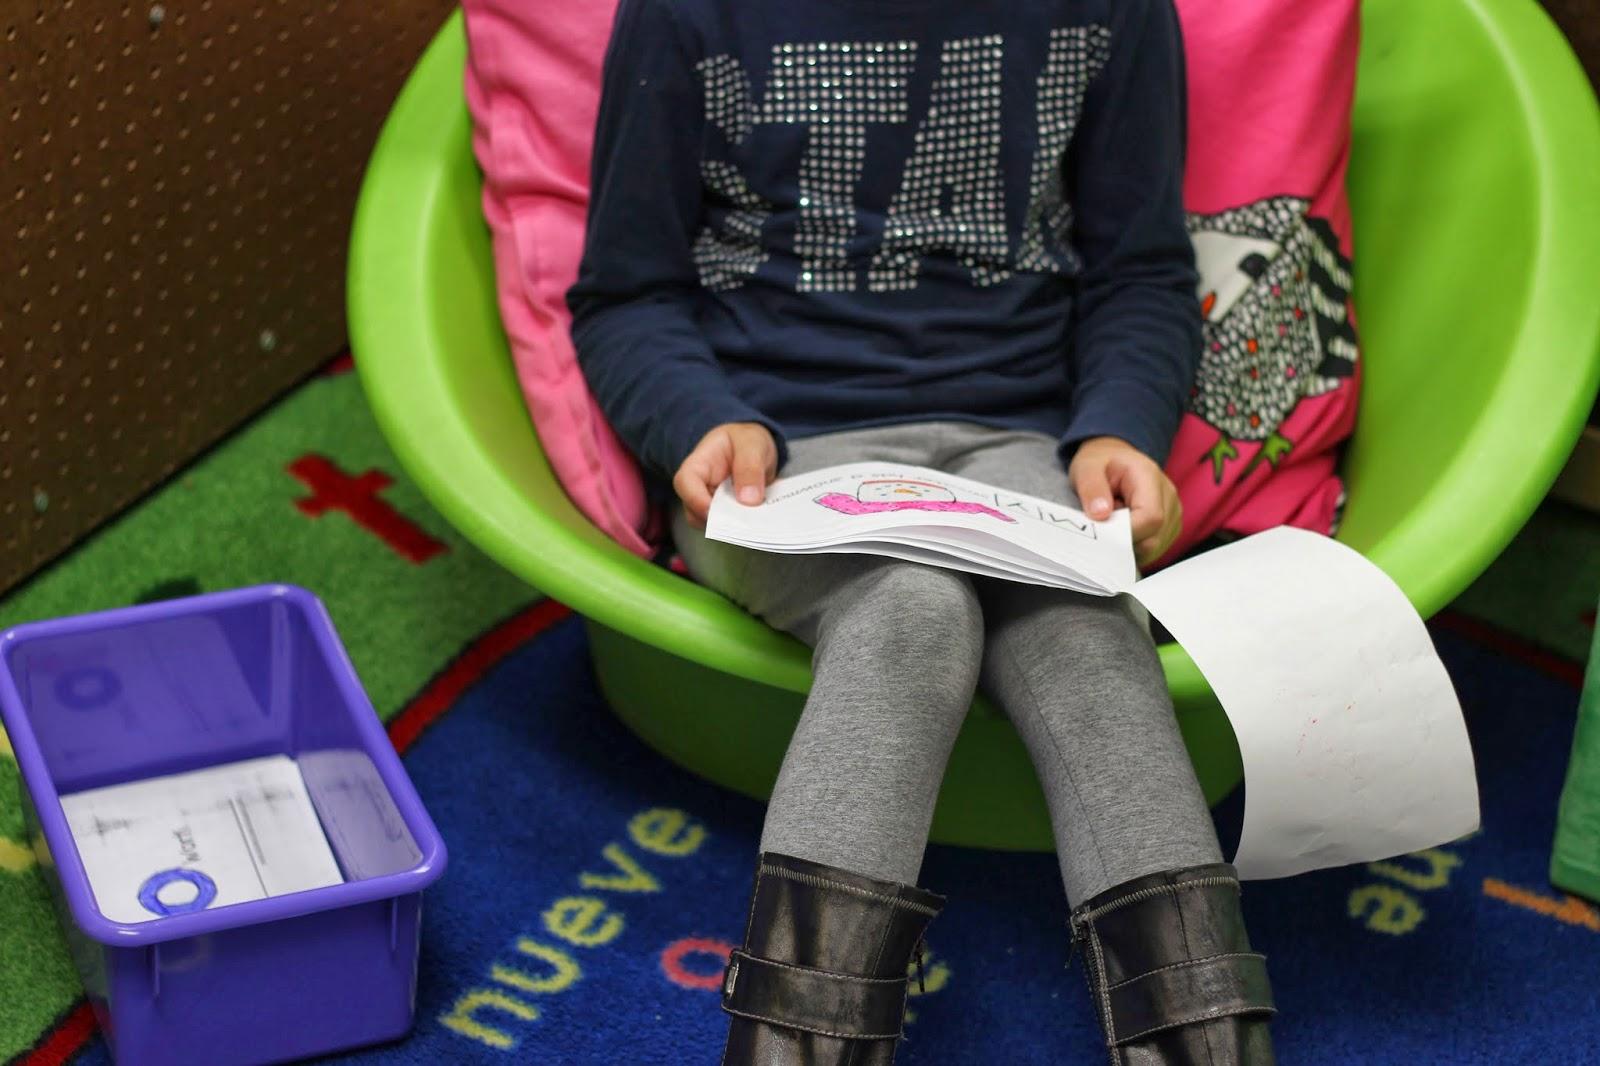 kindergarten smiles sight words in kindergarten and a. Black Bedroom Furniture Sets. Home Design Ideas